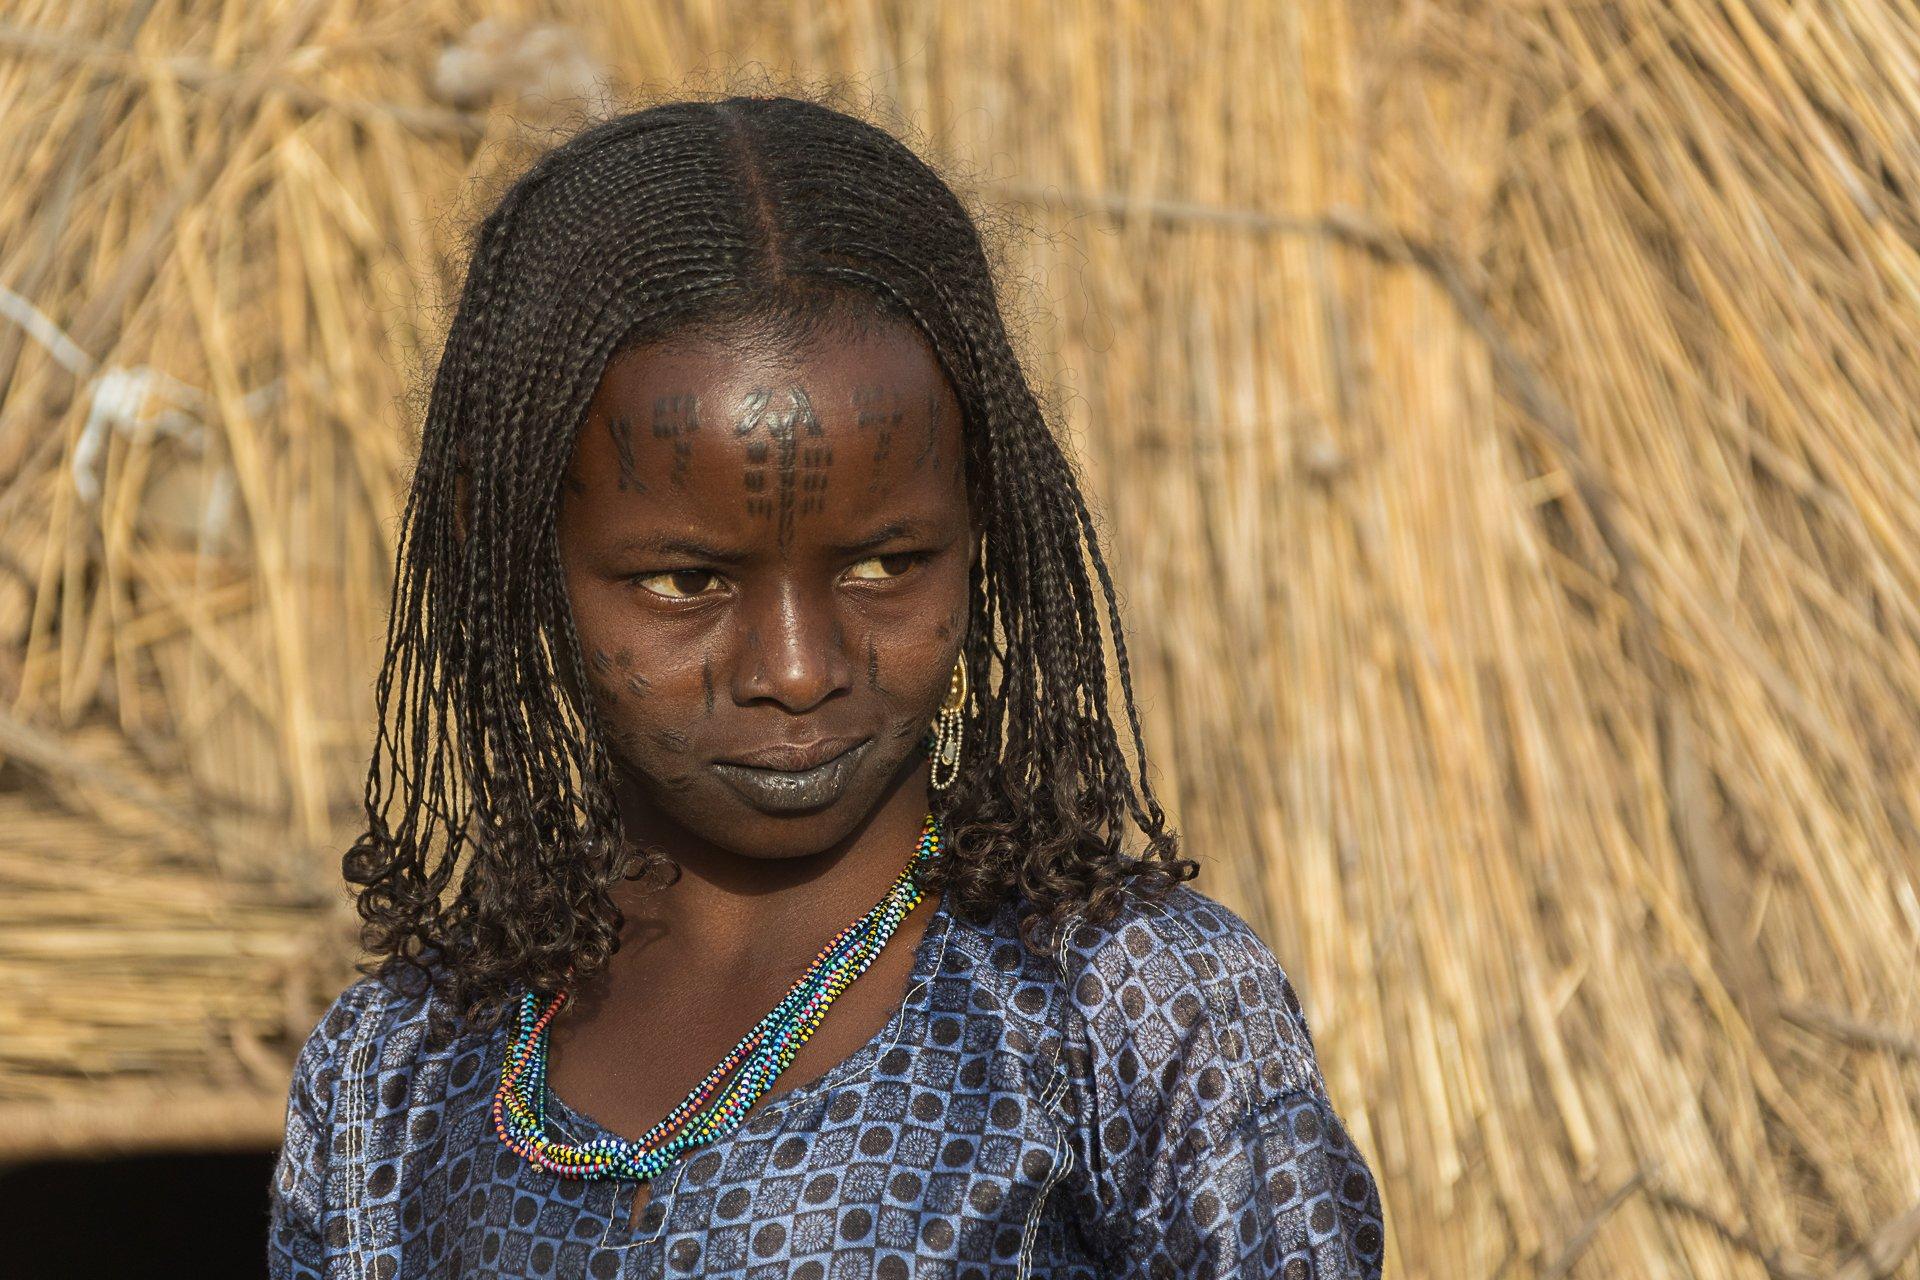 камерун, девочка, африка, Marina Malikova